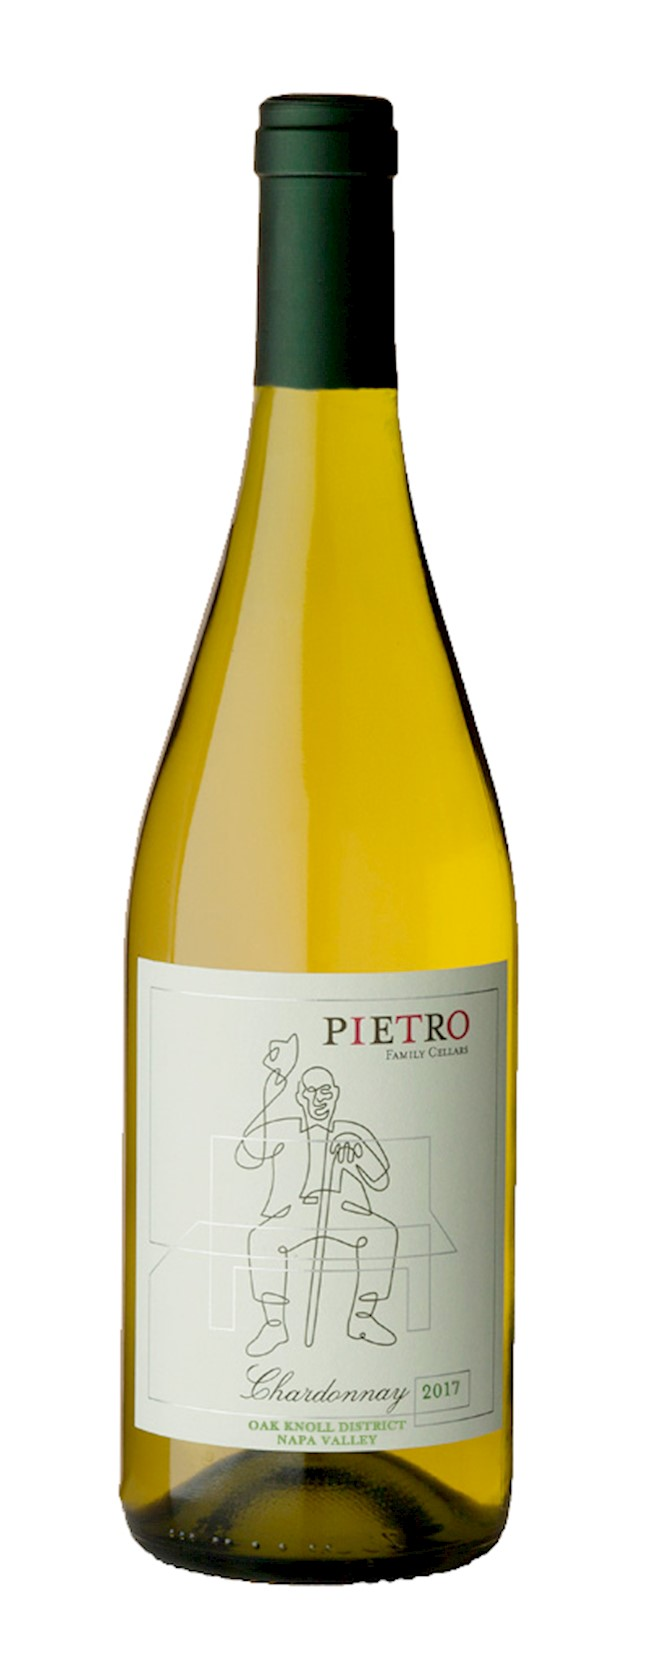 2017 Pietro Family Cellars, Chardonnay, Napa Valley LARGE